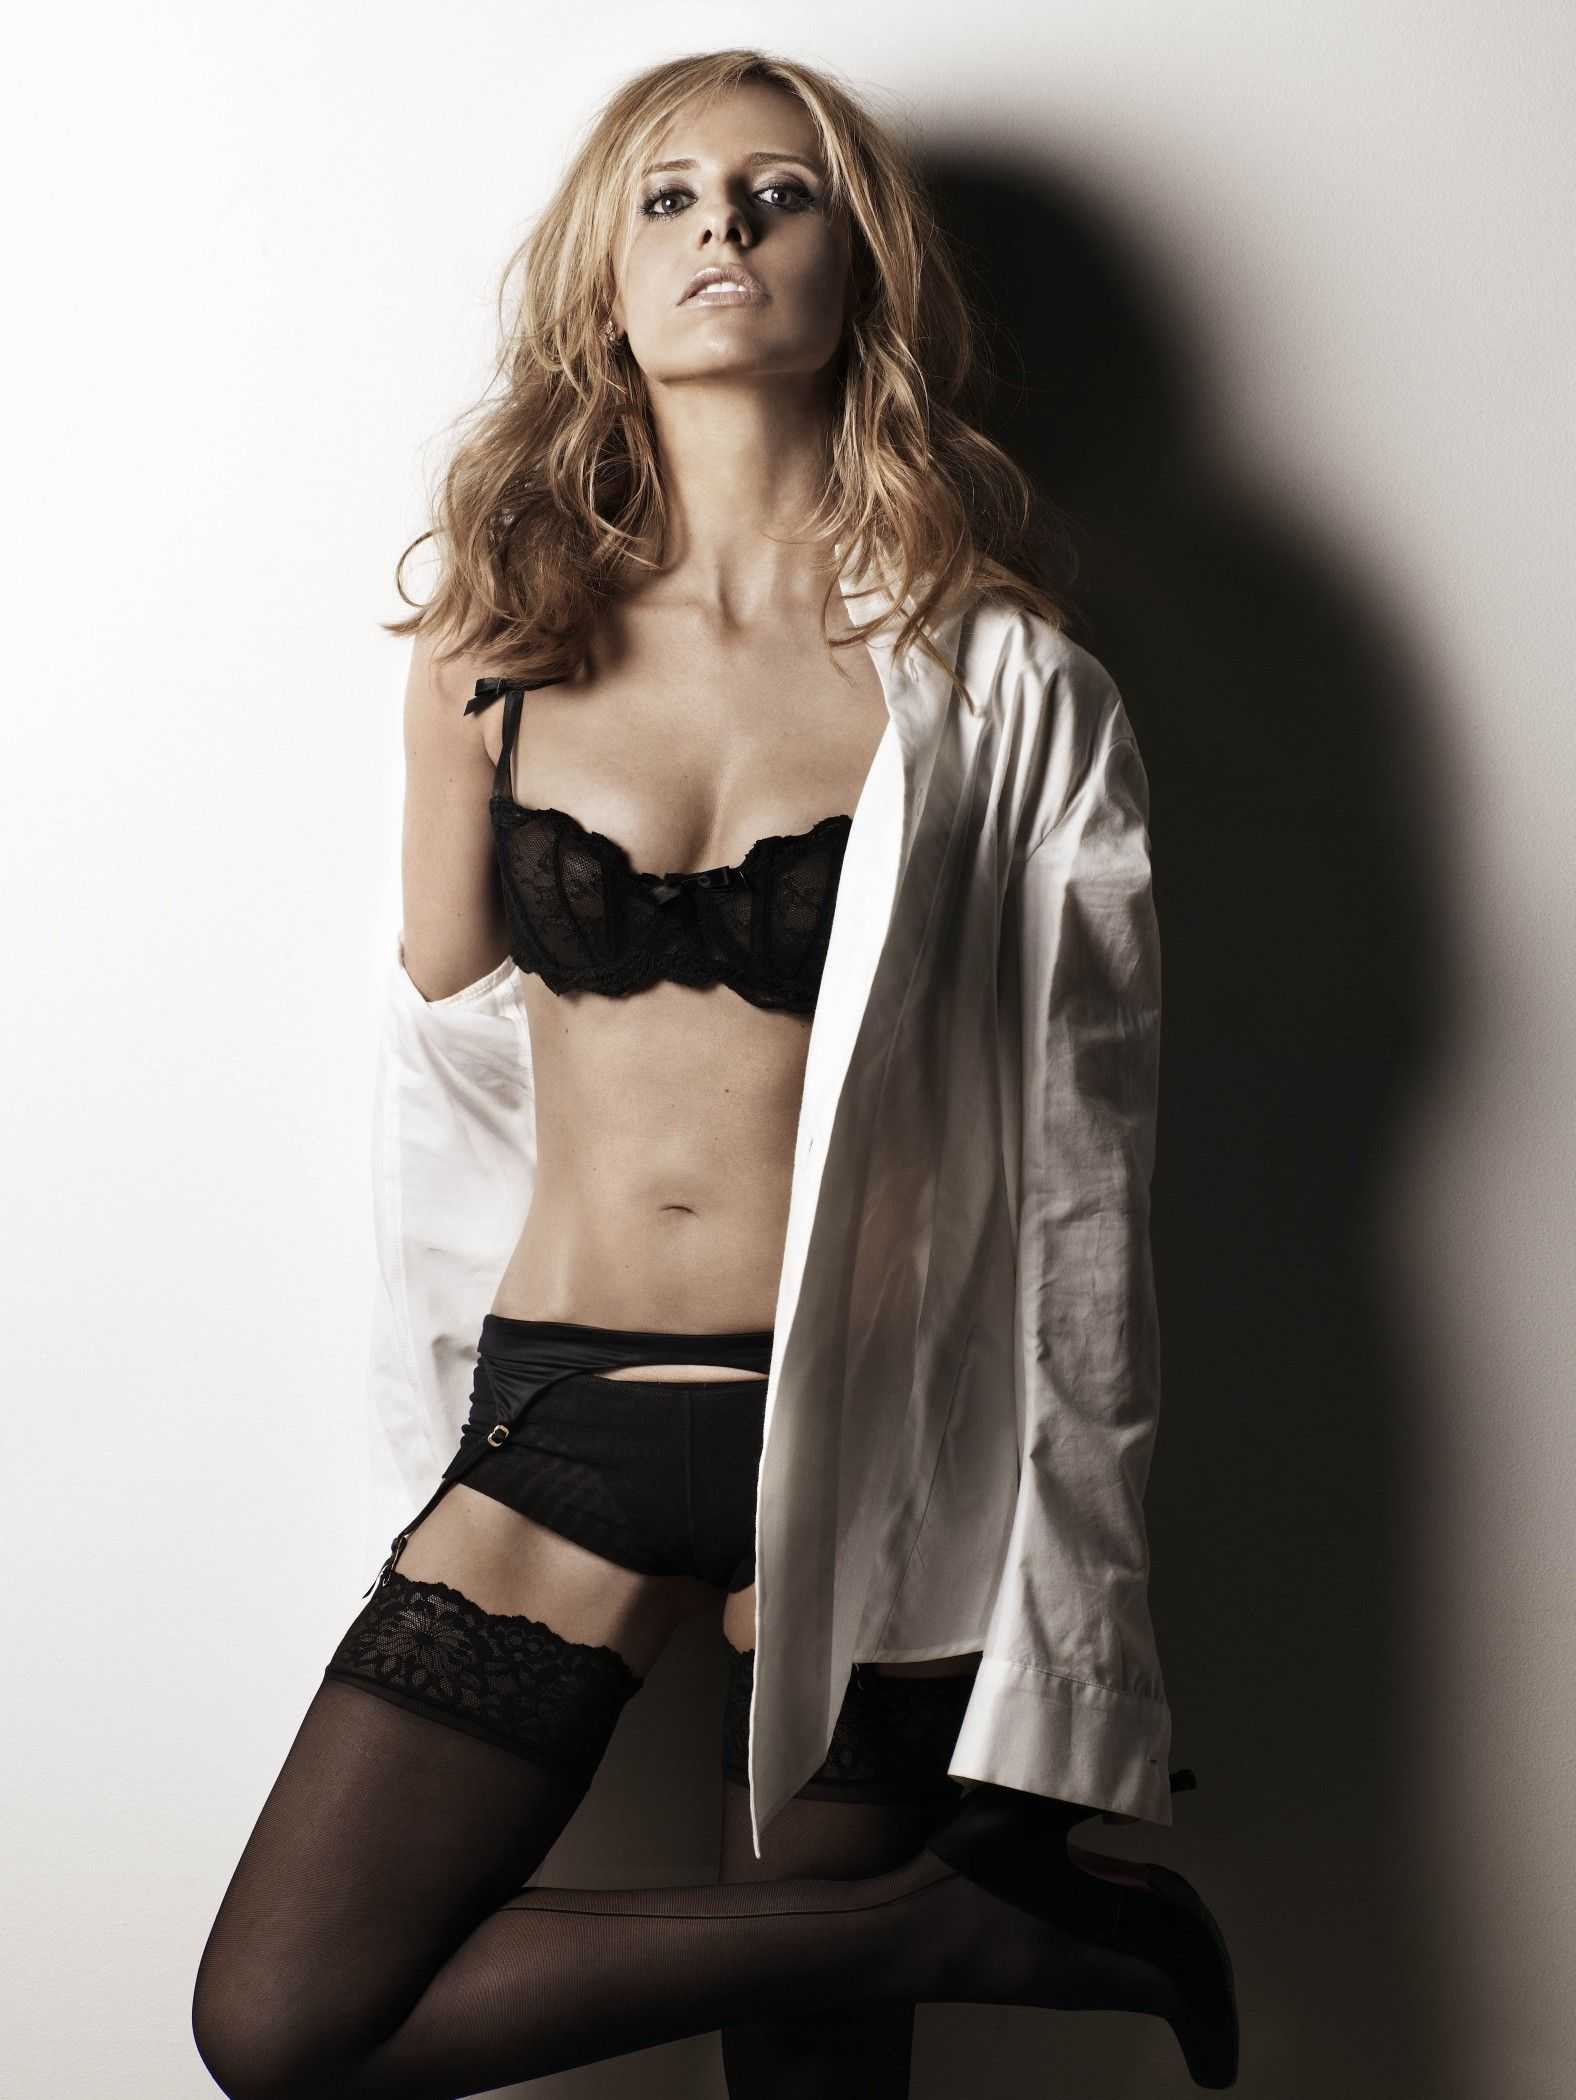 Sarah Michelle Gellar lingerie